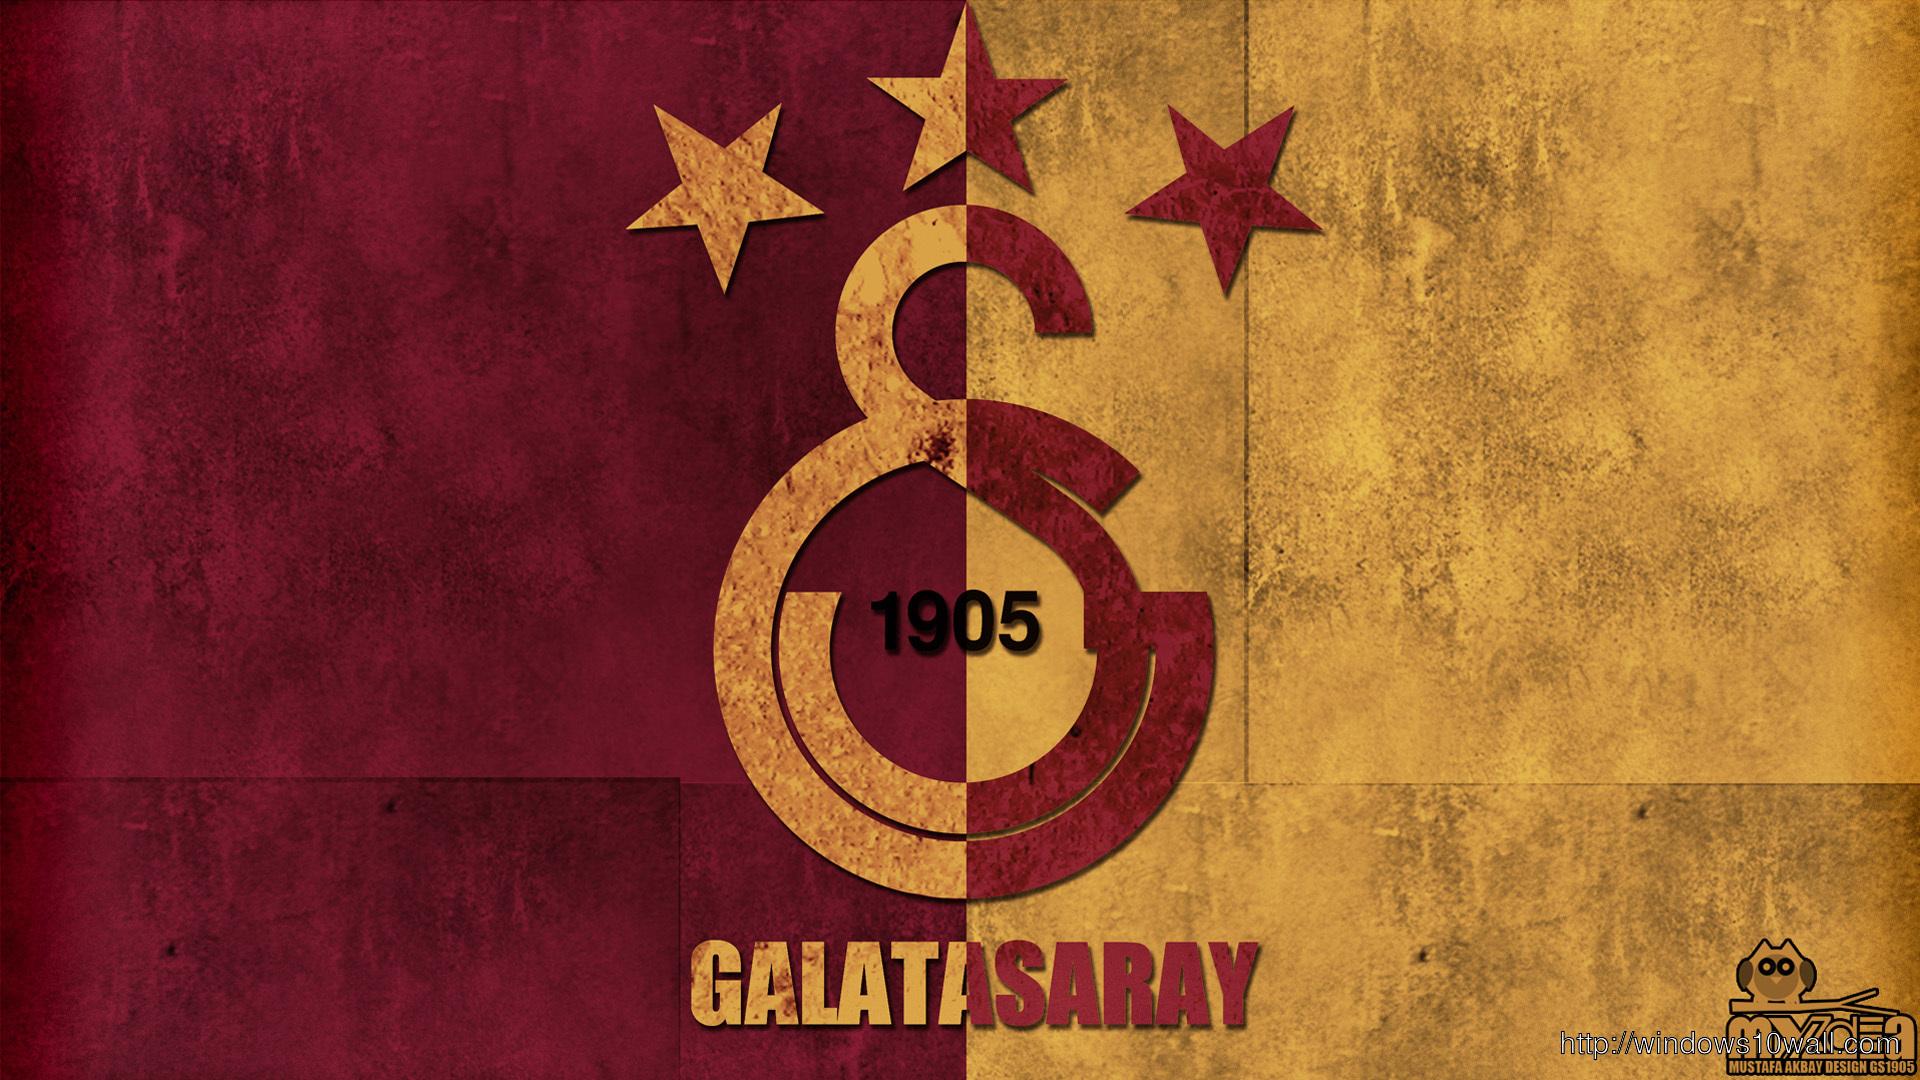 Galatasaray Logo Background Wallpaper ⋆ Windows 10 Wallpapers